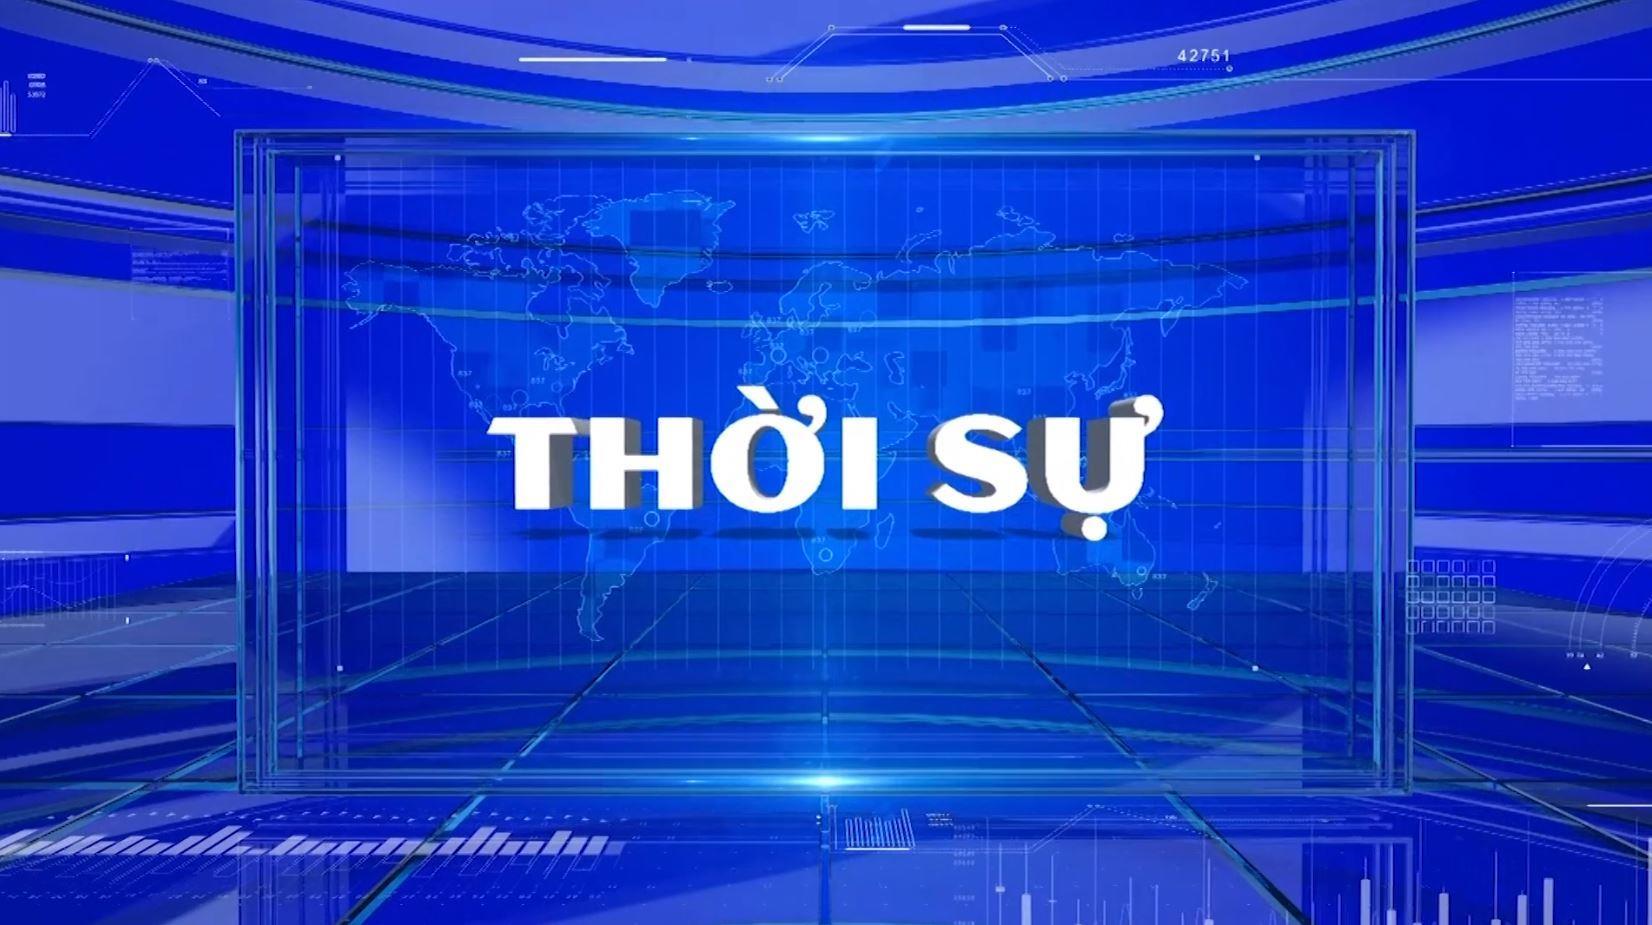 Thời sự 11h30 T4 (20-11-2019)